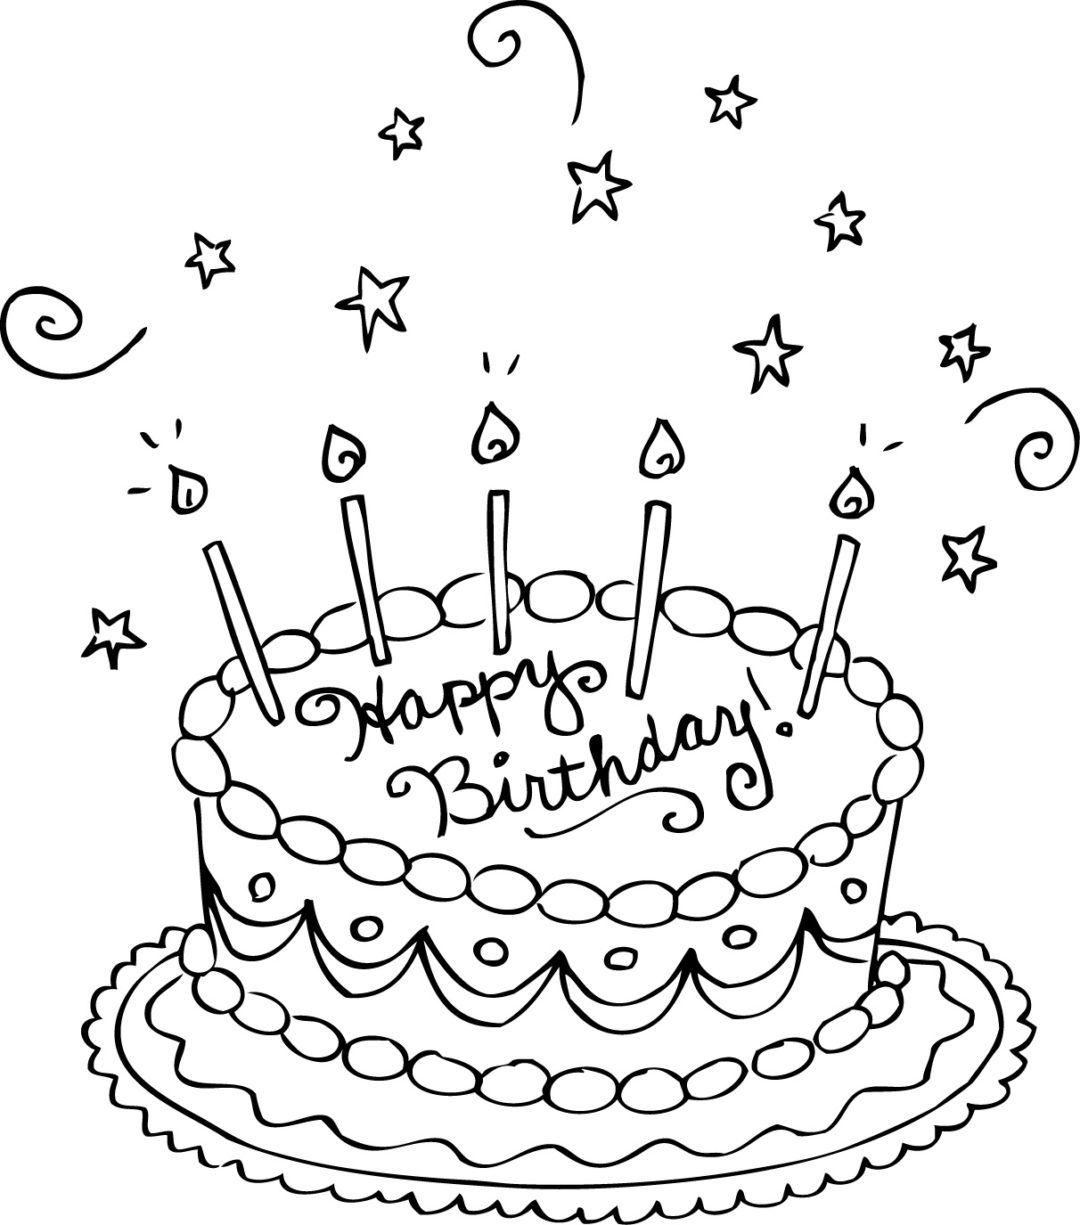 22+ Printable happy birthday coloring sheet information